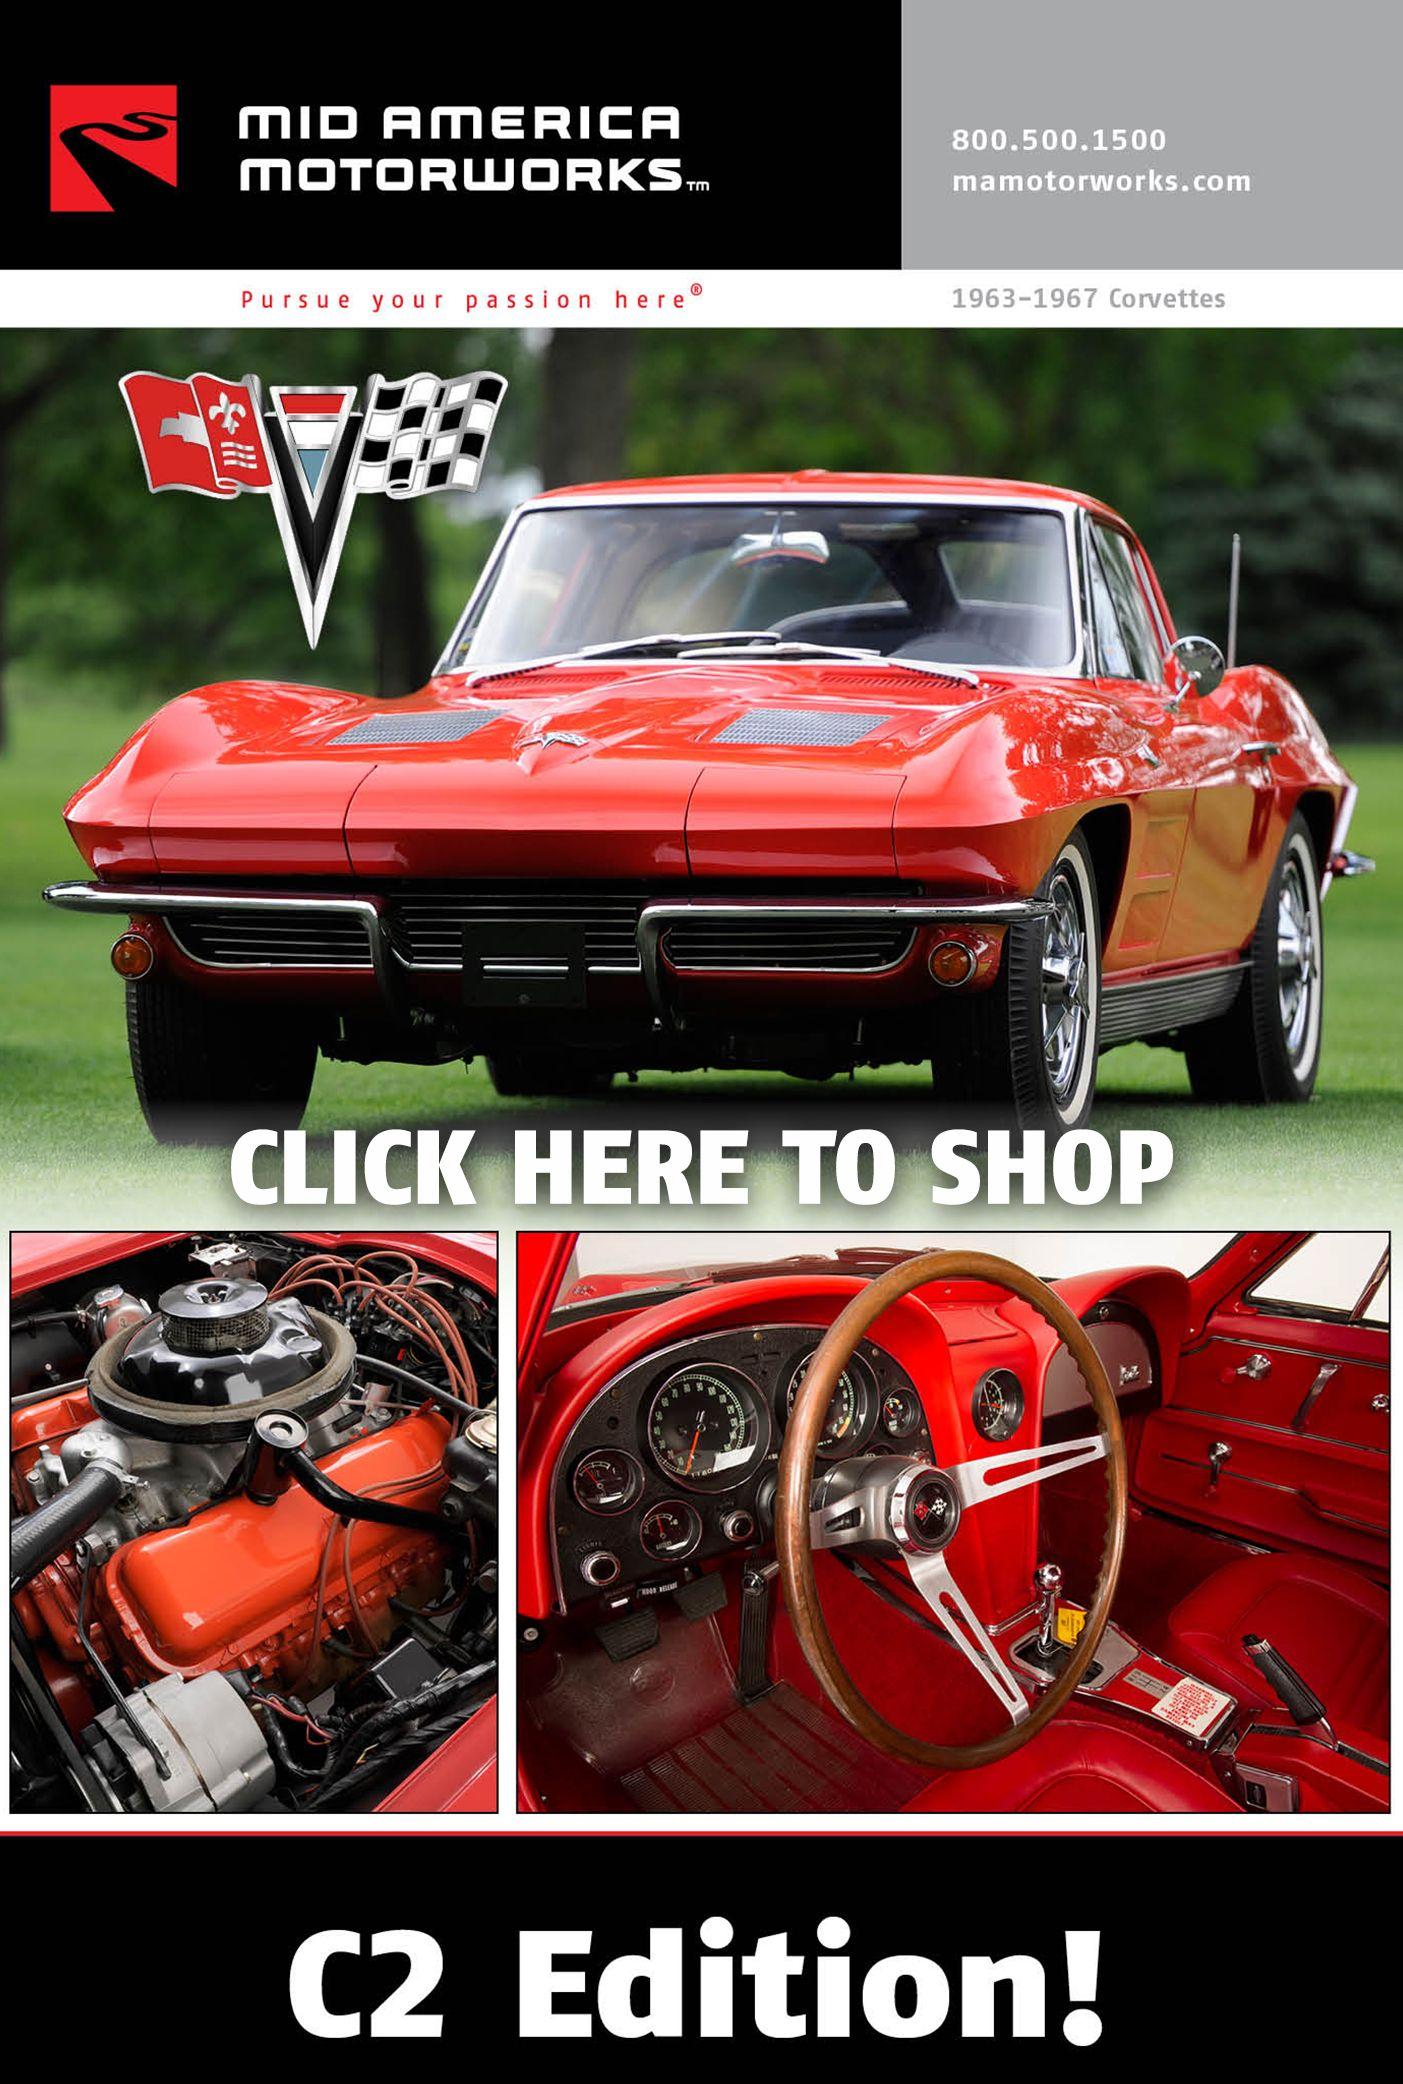 1963 1967 C2 Corvette Click N Shop Electronic Catalog Http Www Mamotorworks Com Corvette Catalogviewer 1963 1967 C2 Corvette Corvette Catalog Catalog Cover